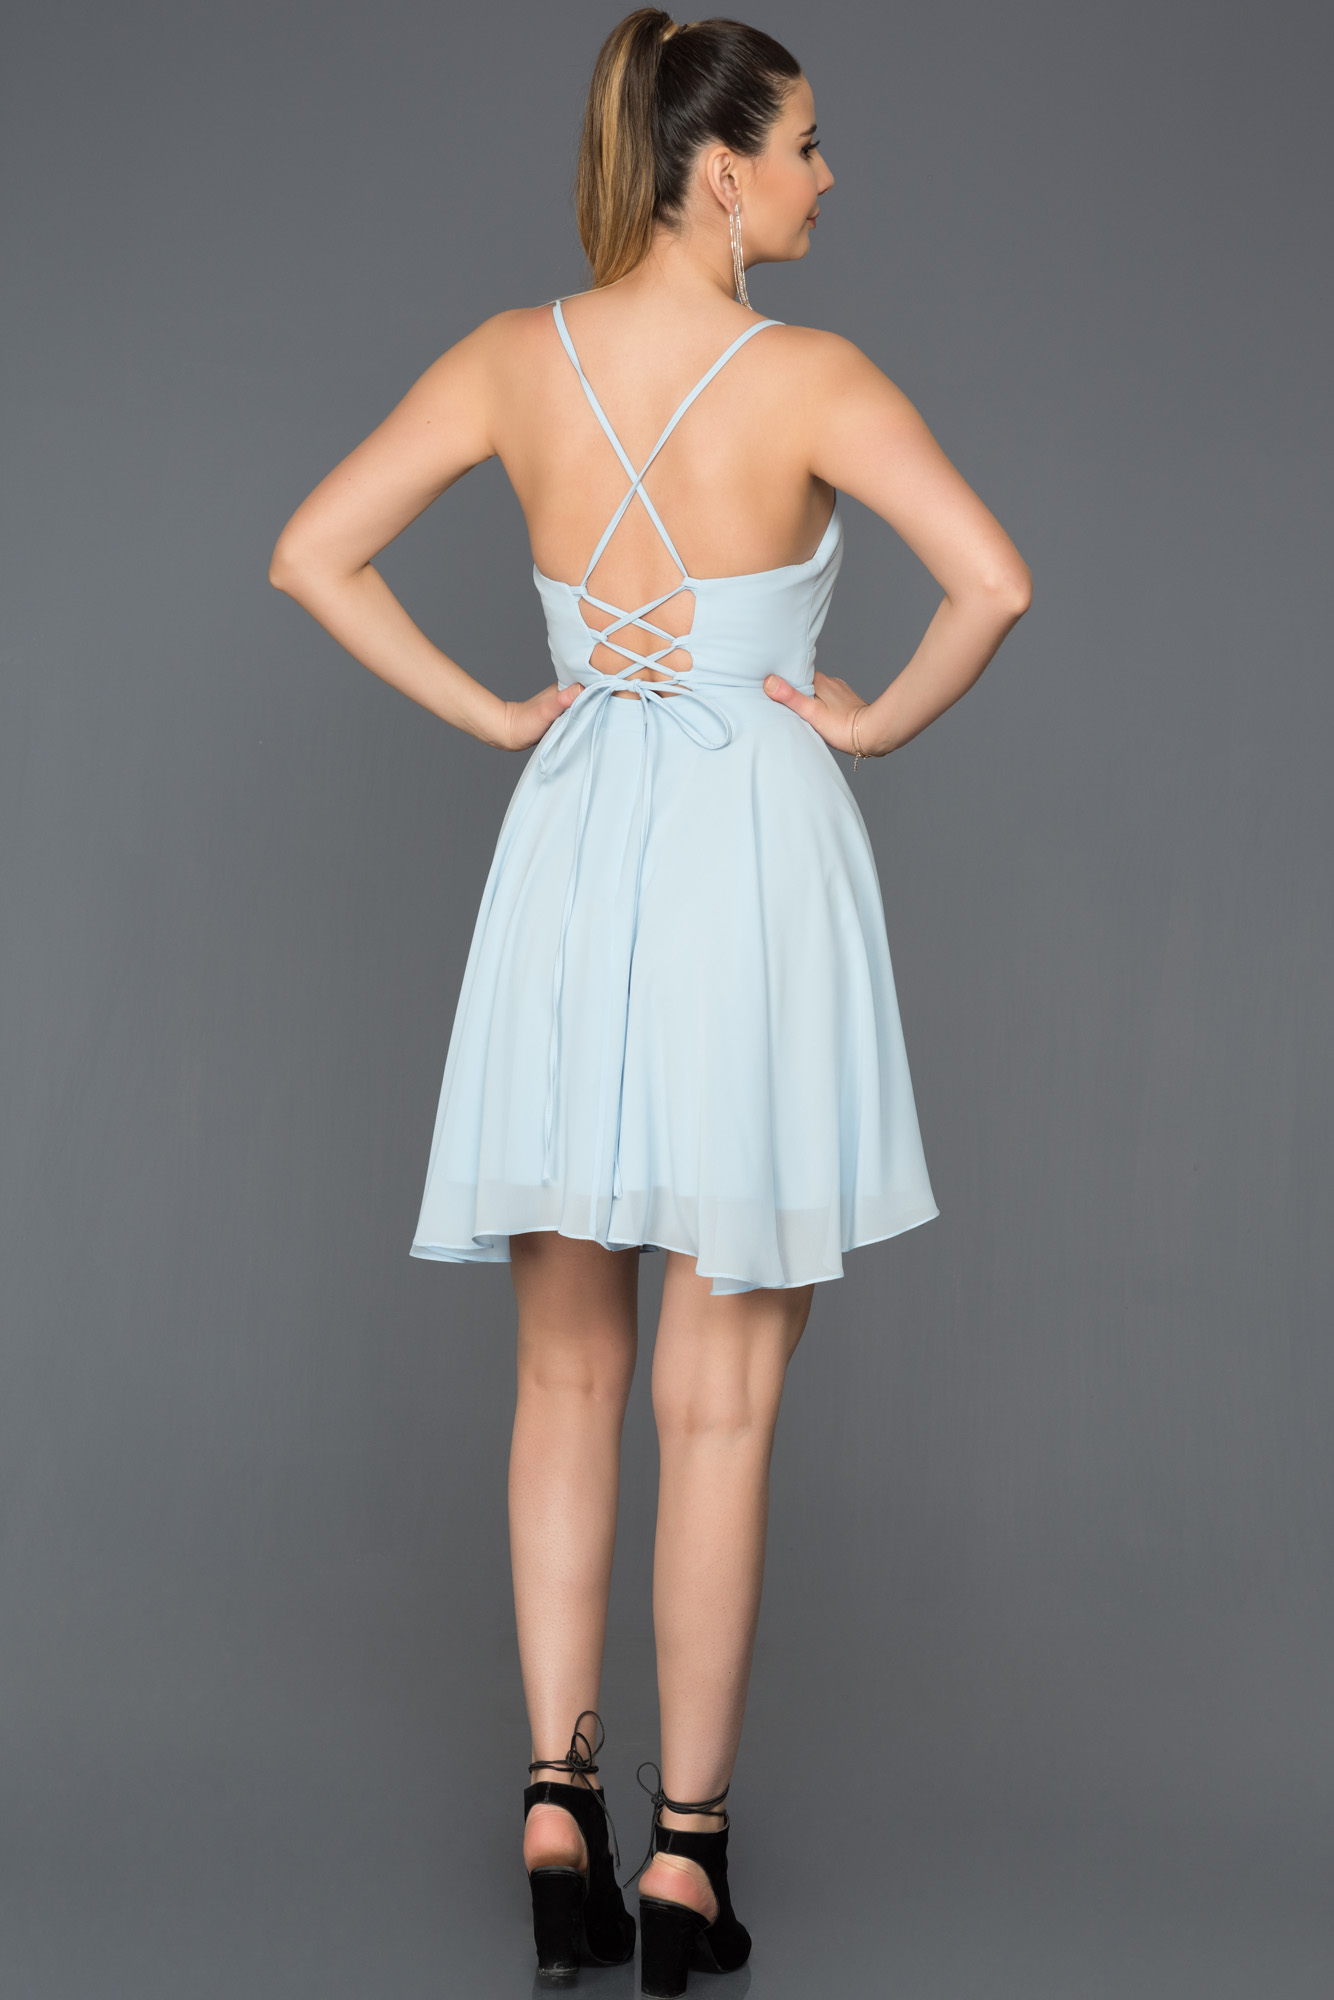 Mavi Sırt Dekolteli Şifon Elbise